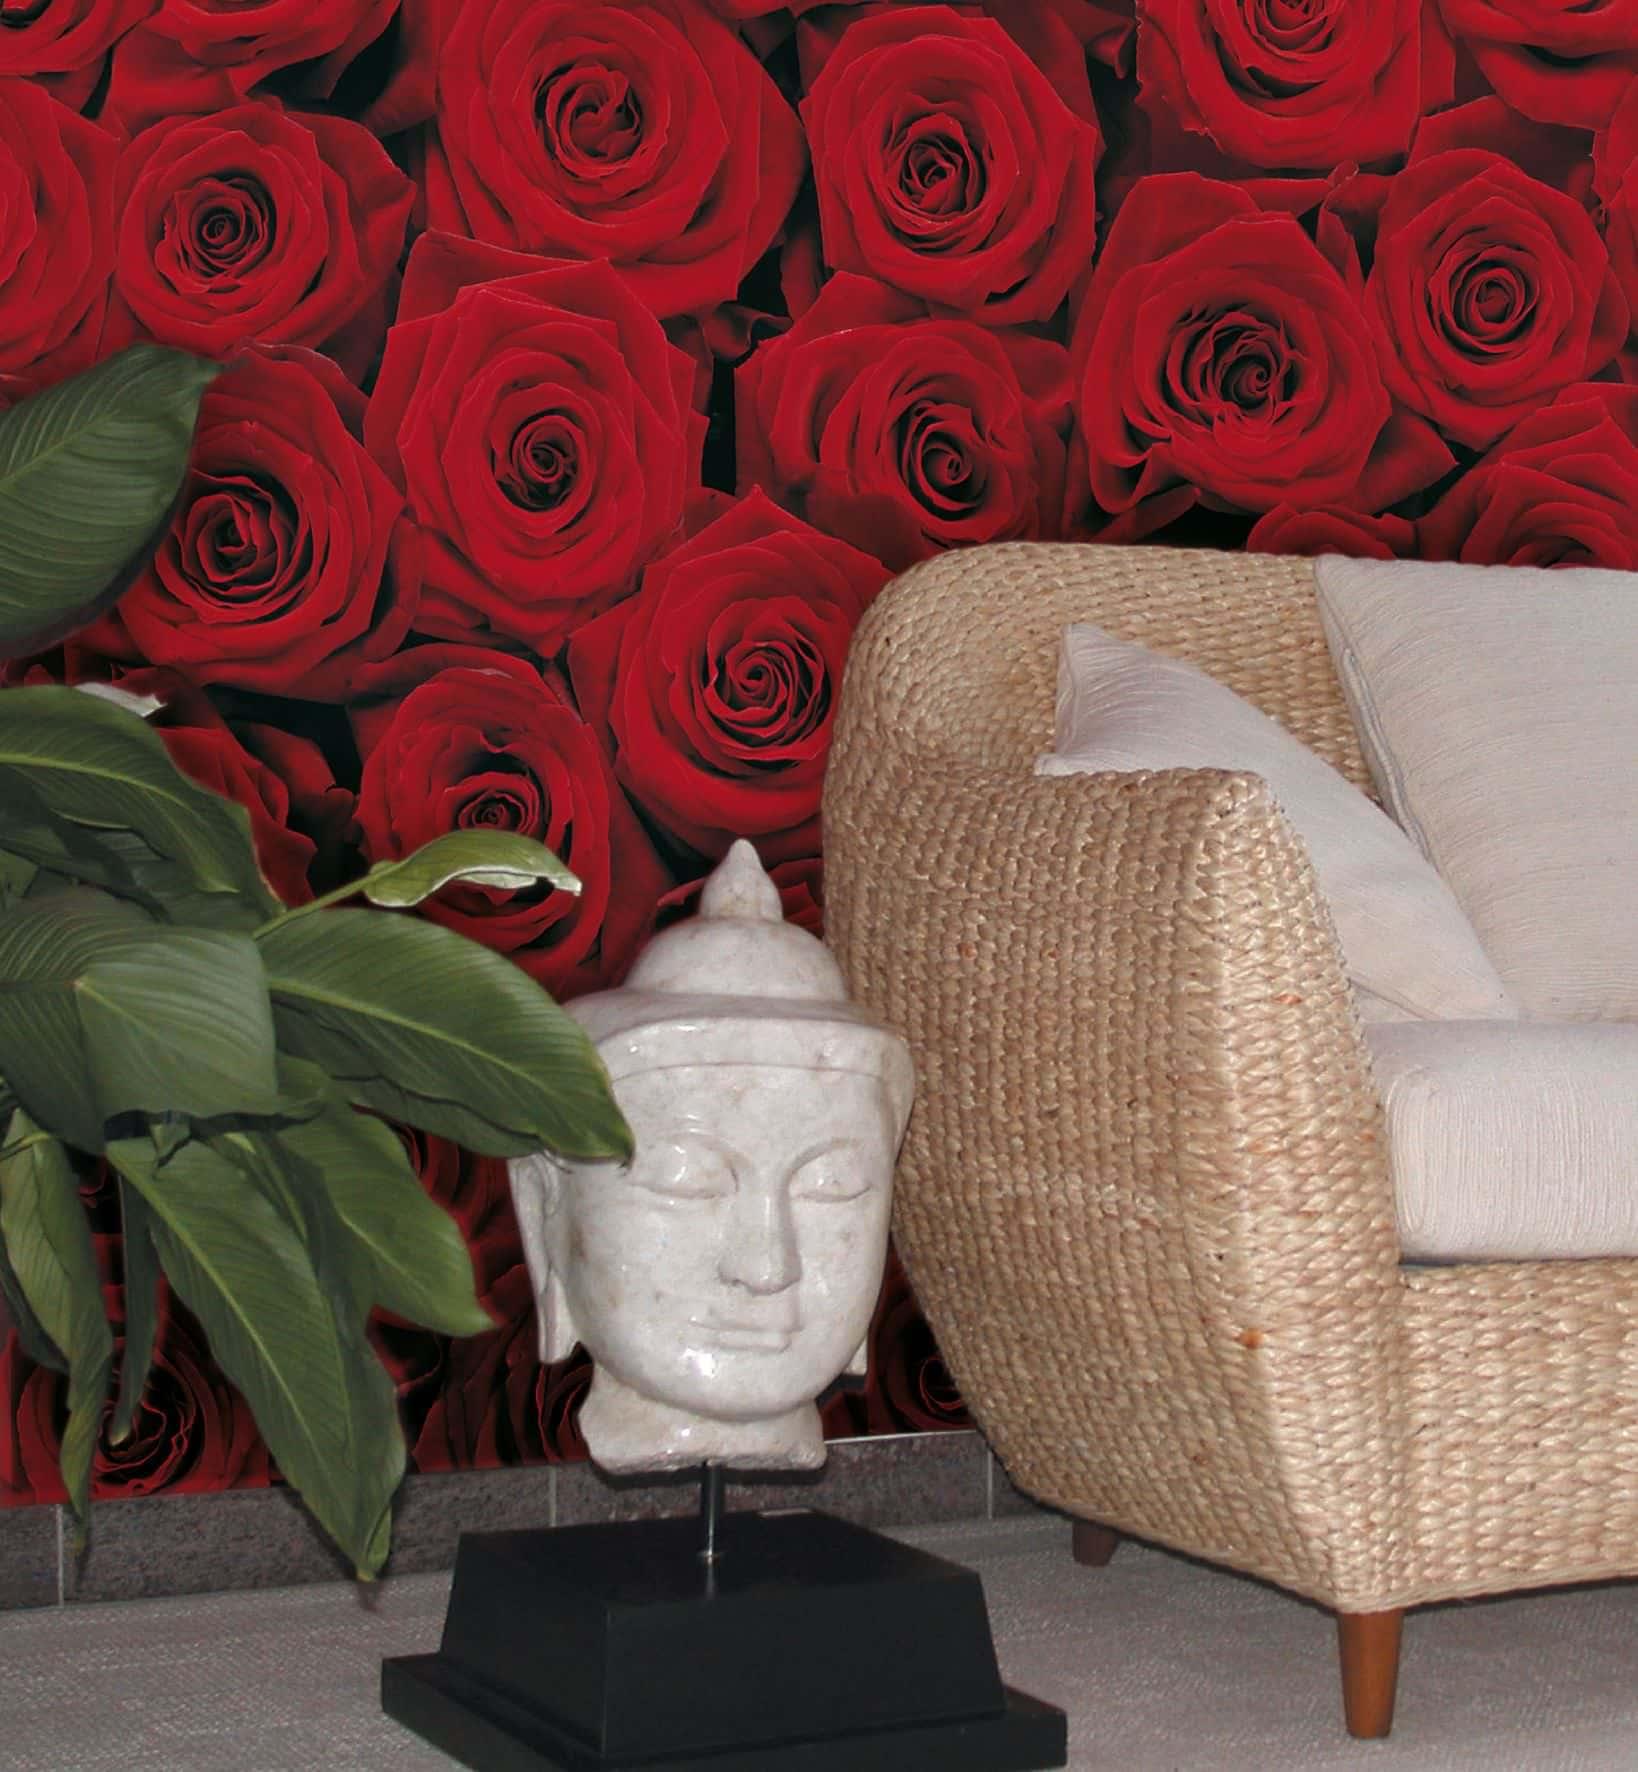 4-077 Roses